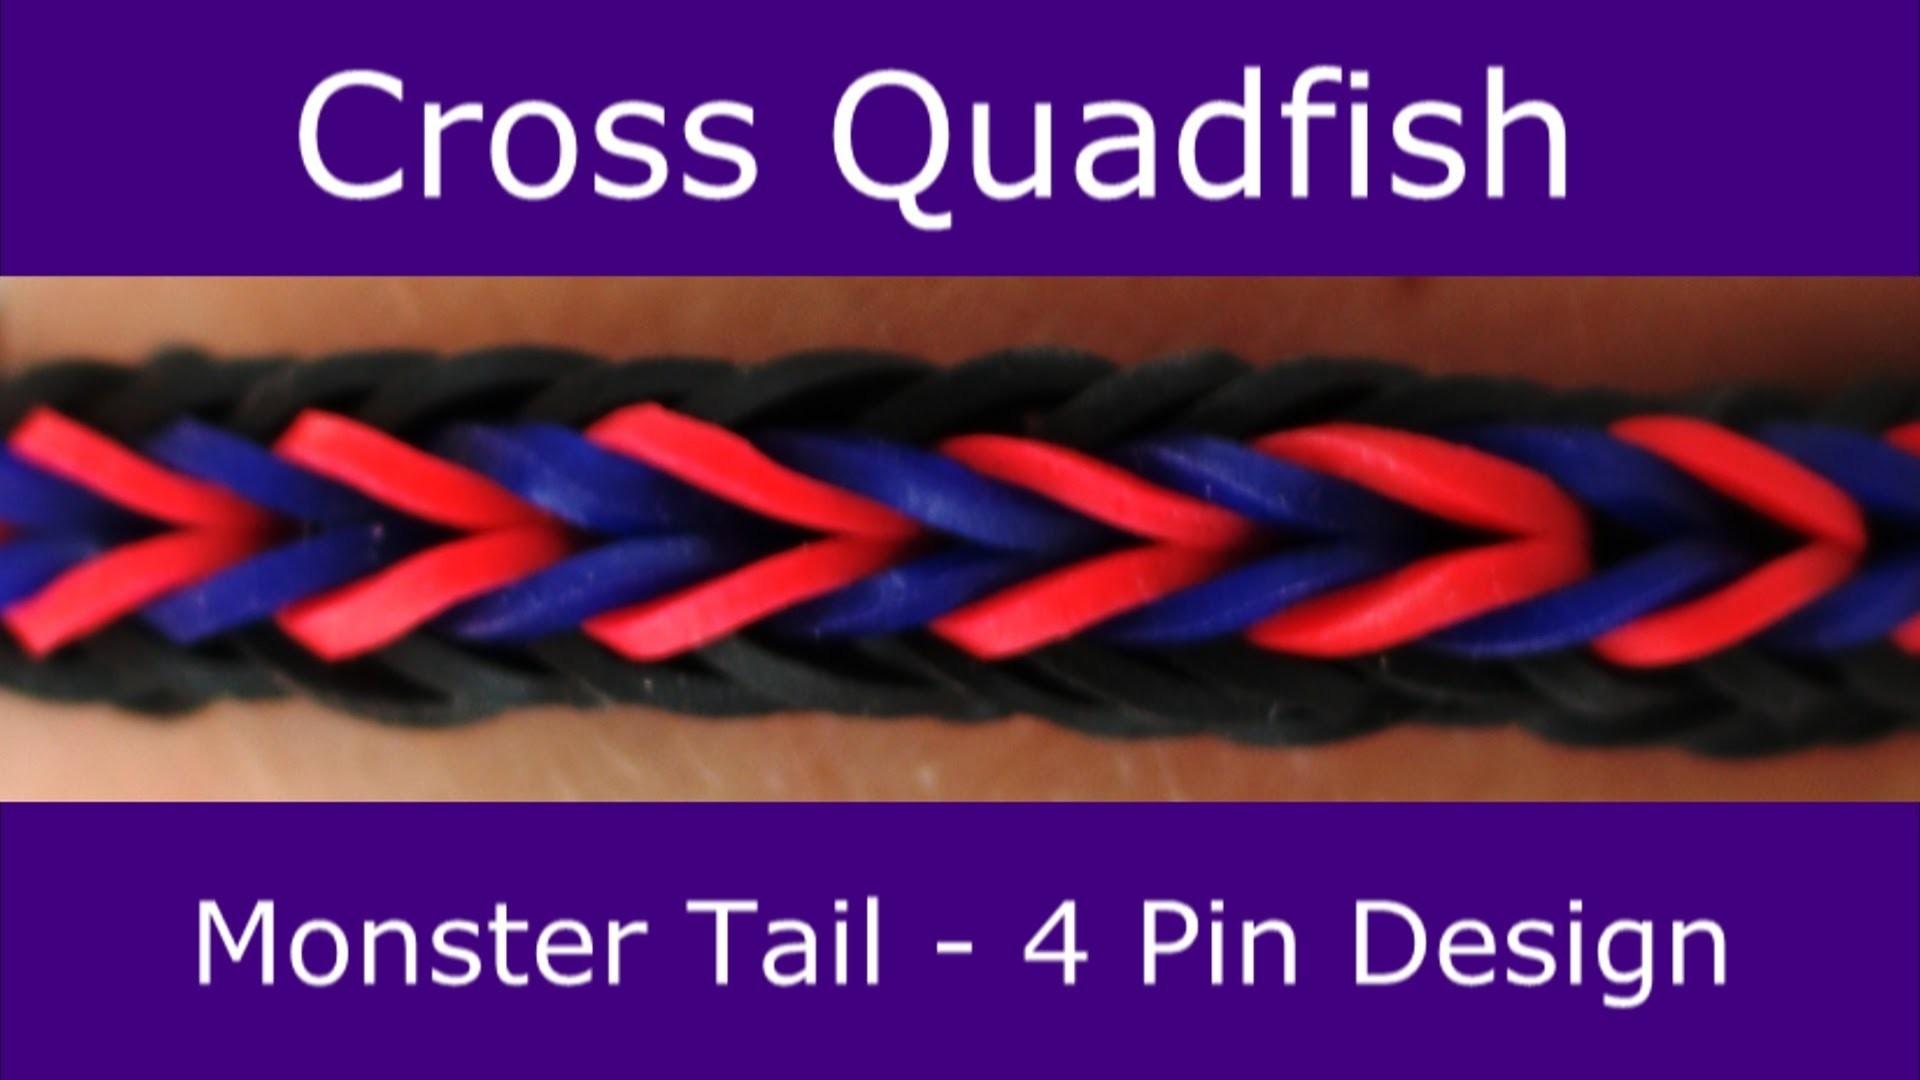 Monster Tail®  Cross Quadfish Bracelet by Rainbow Loom